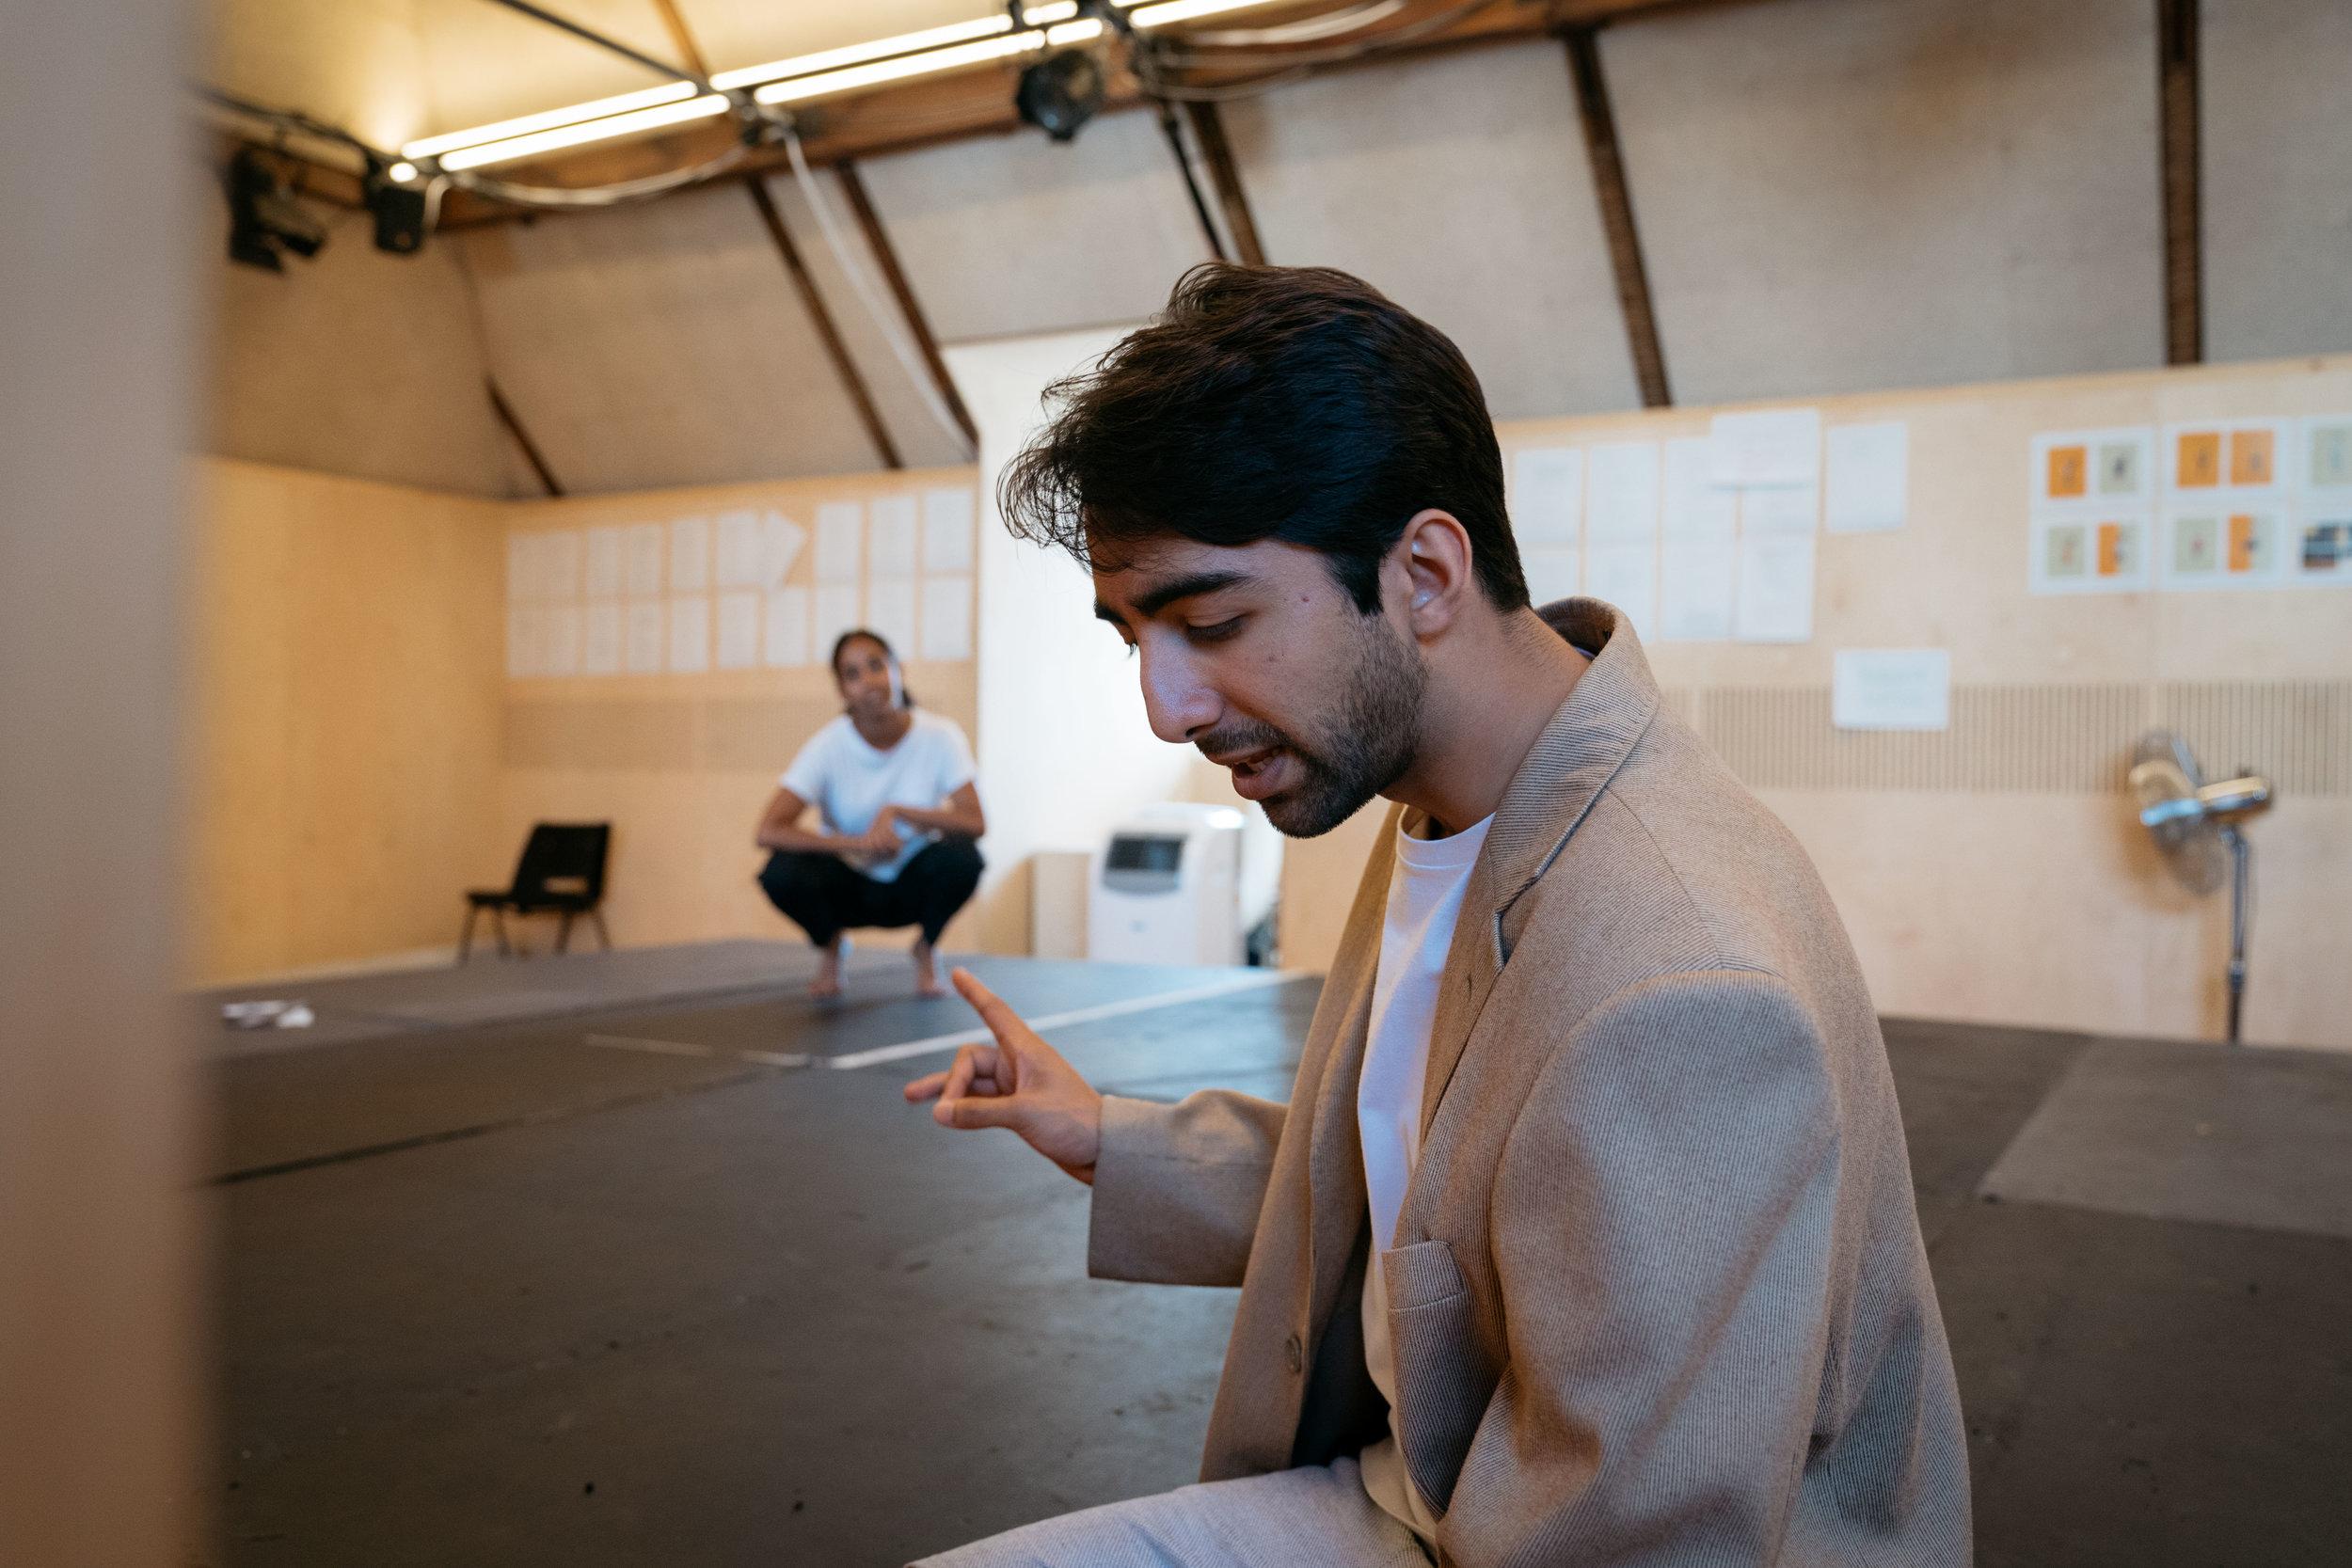 Anjana Vasan and Shubham Saraf in rehearsal for 'An Adventure', photo by Helen Murray.